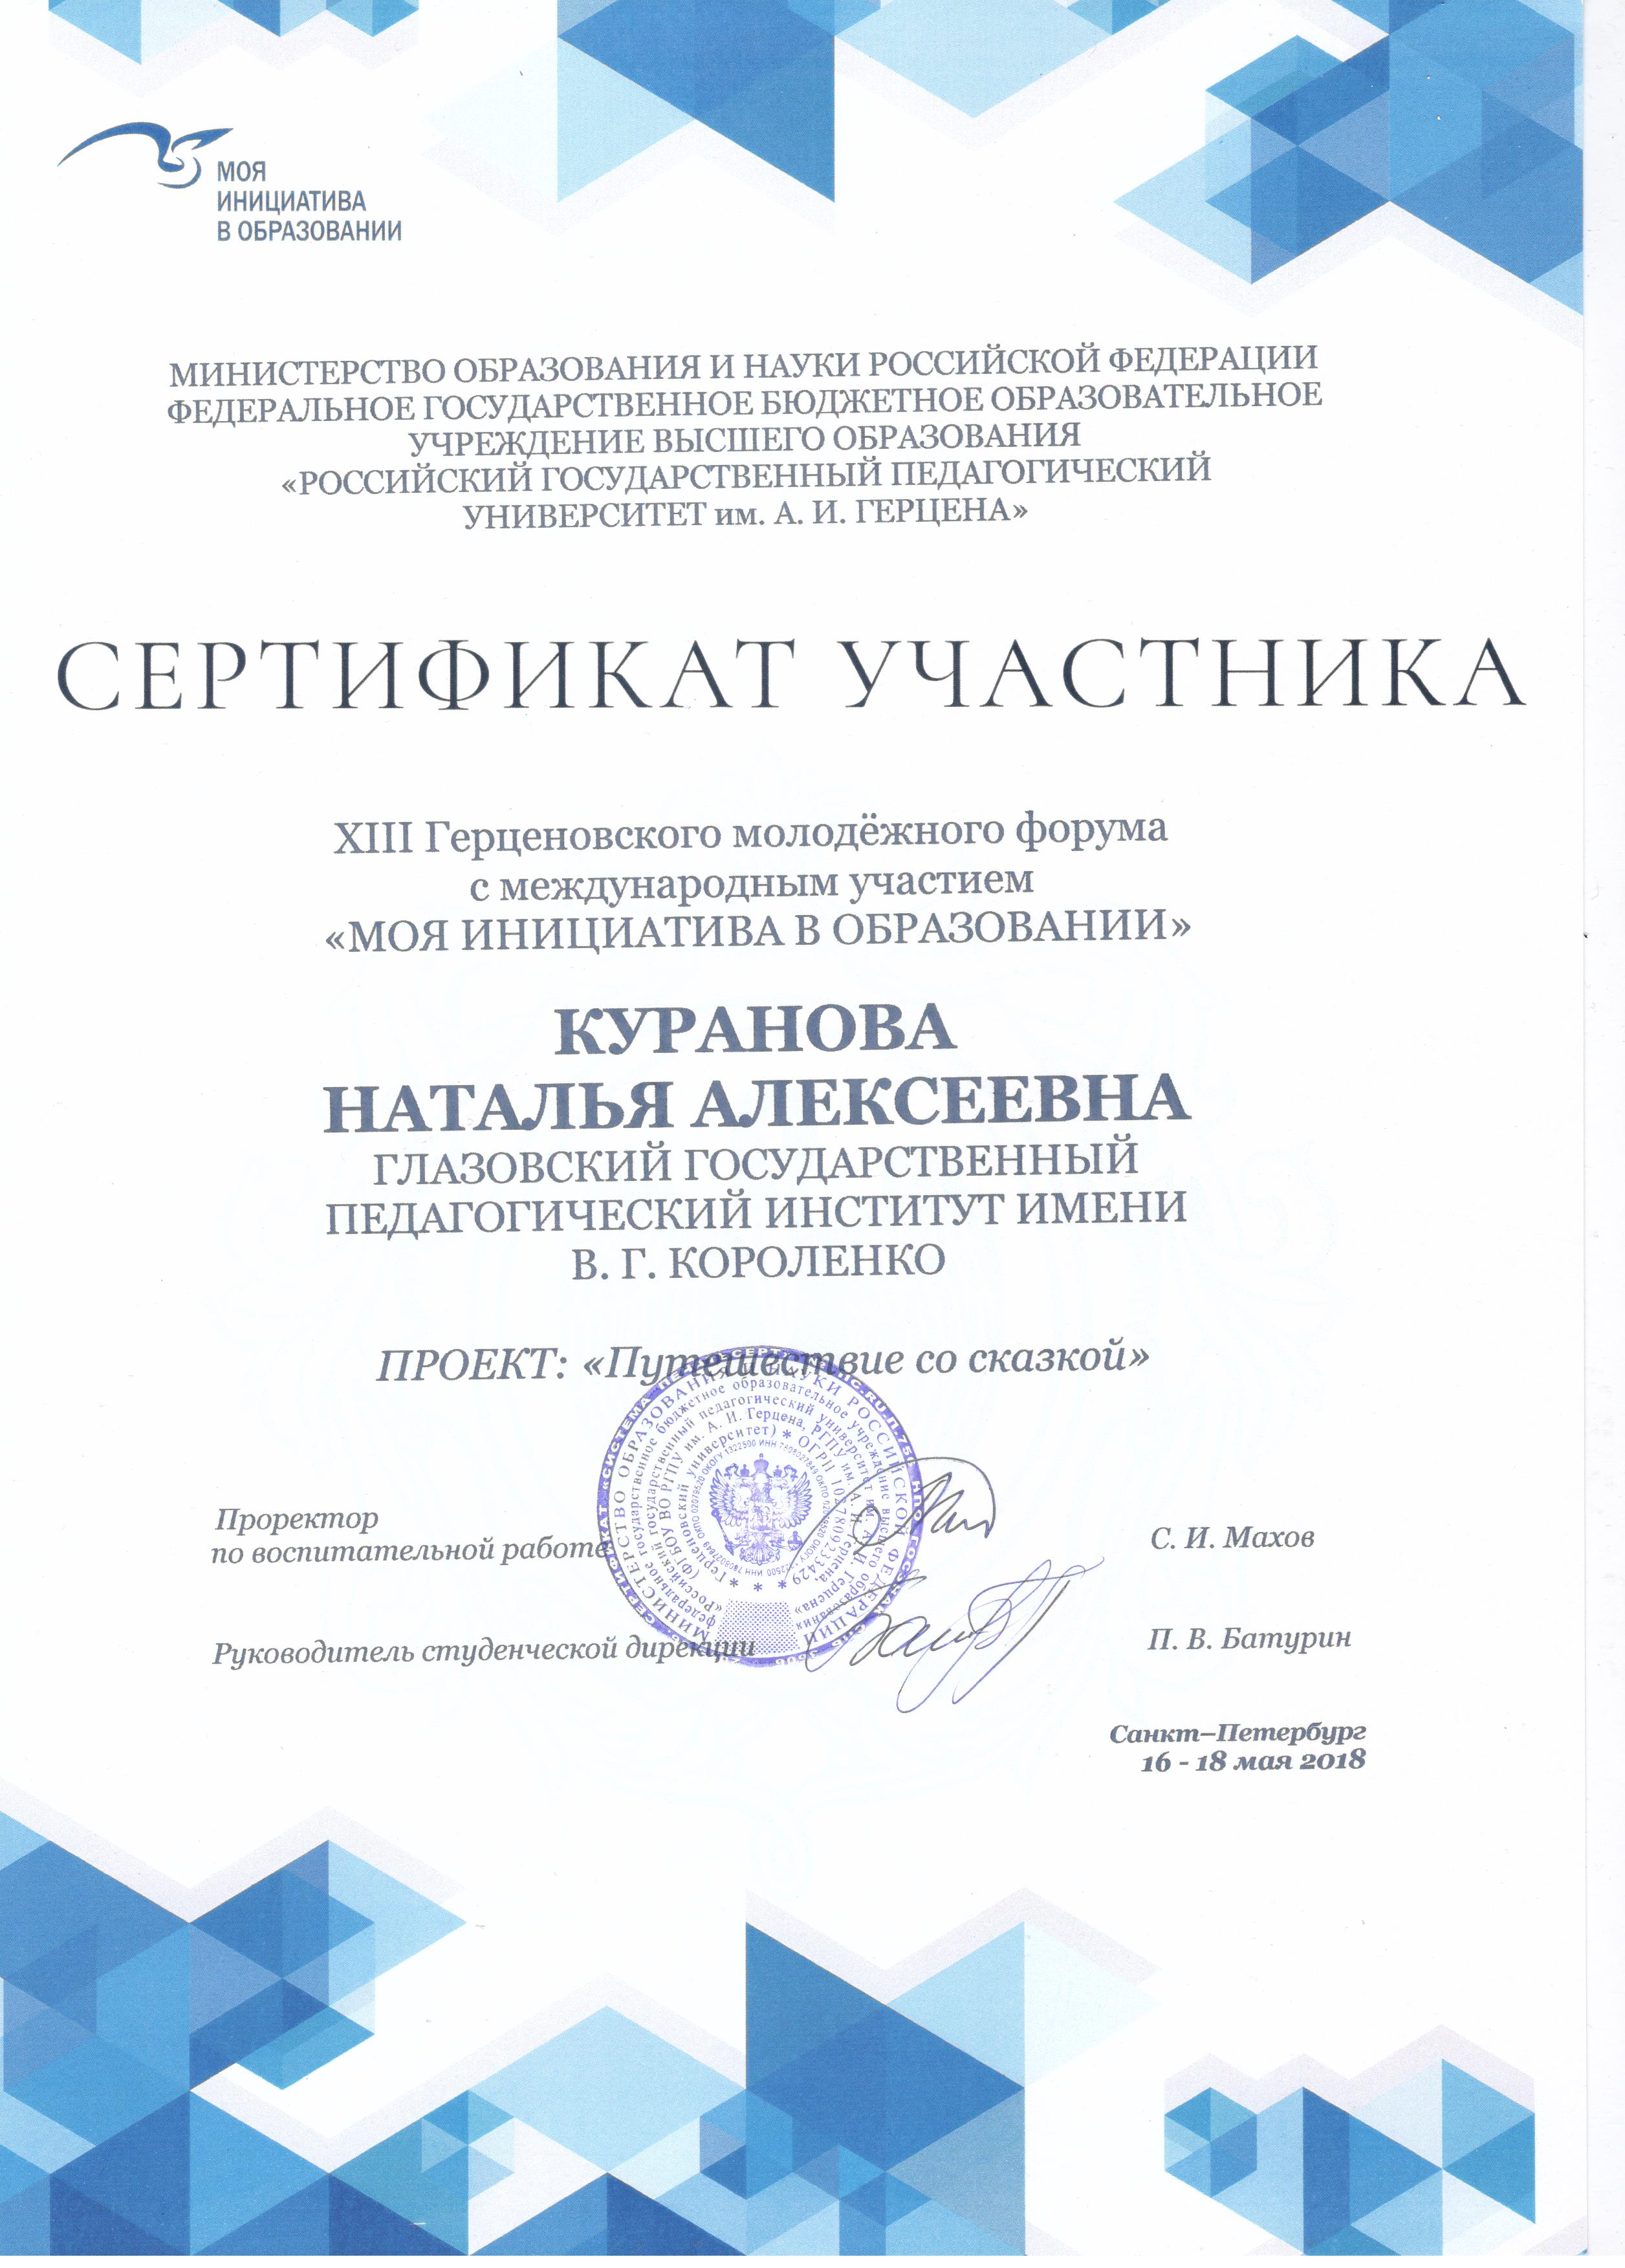 sertifikat putew so skaz